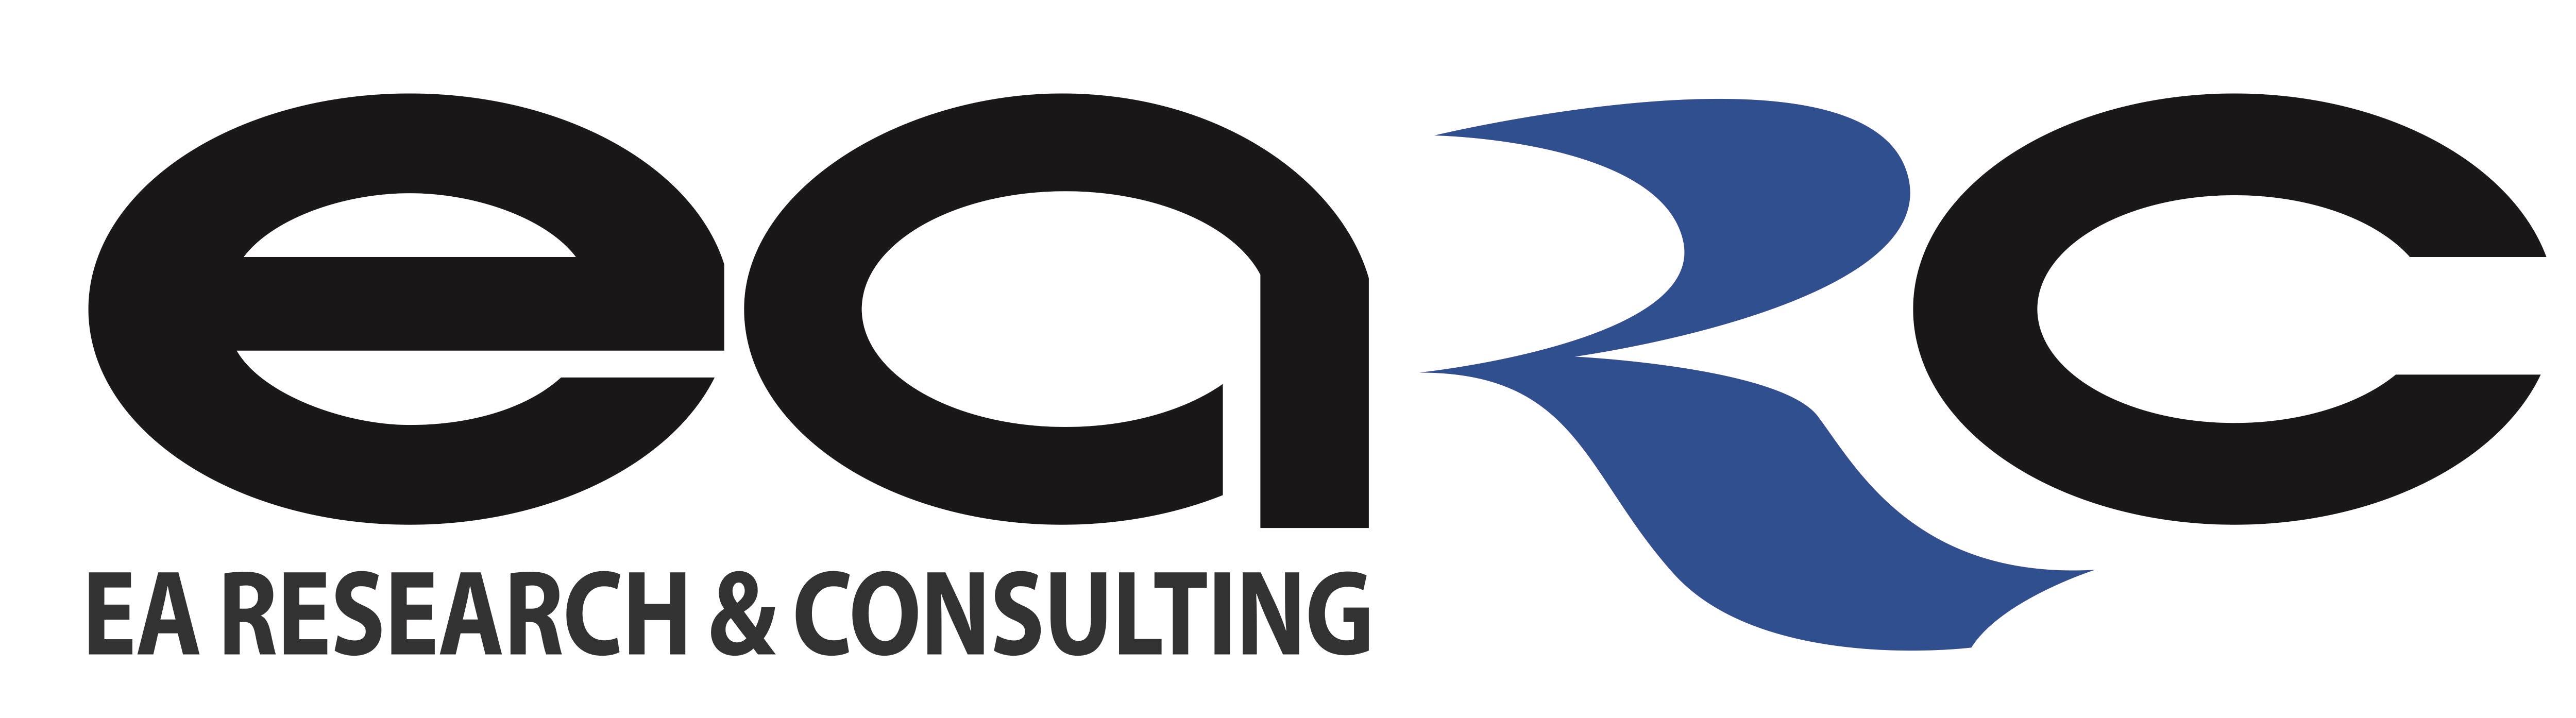 earc logo 1